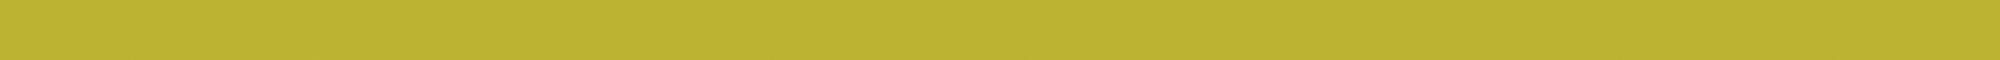 border-yellow